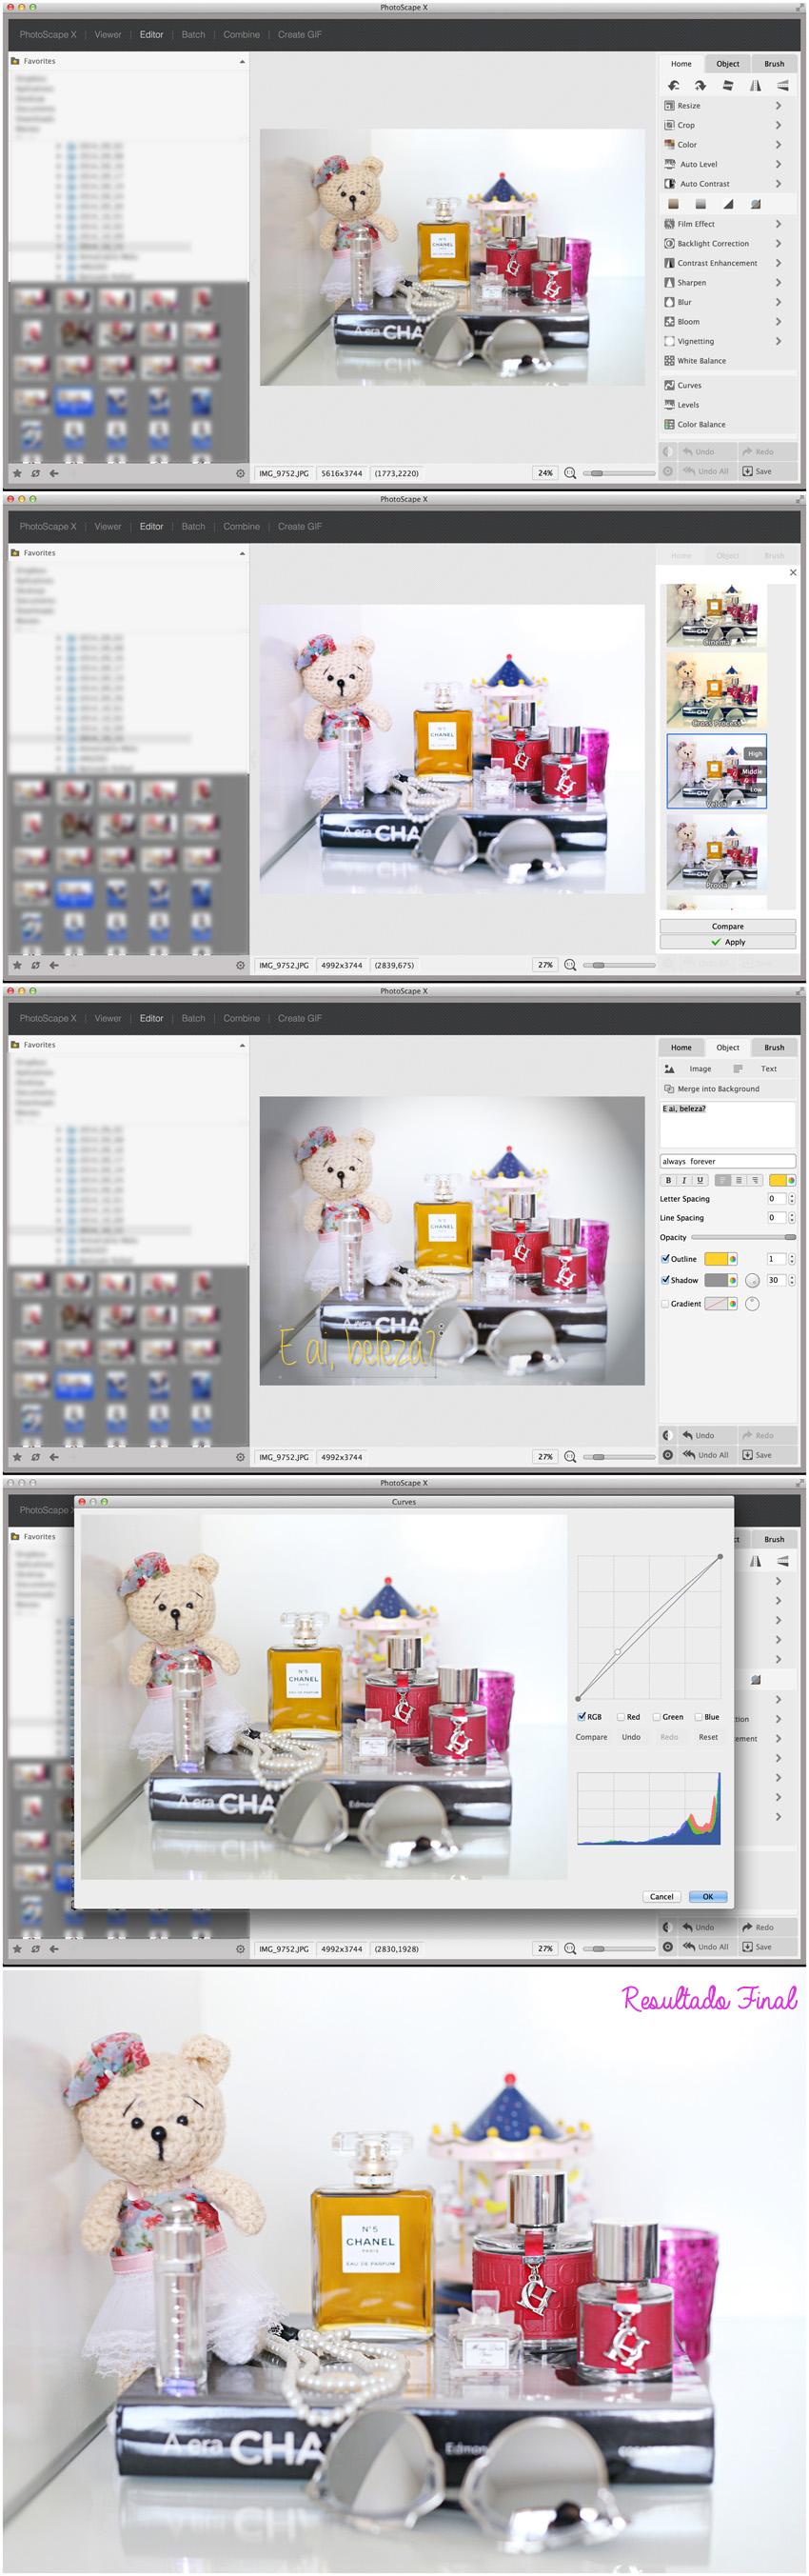 Editor de imagens gratuito 1